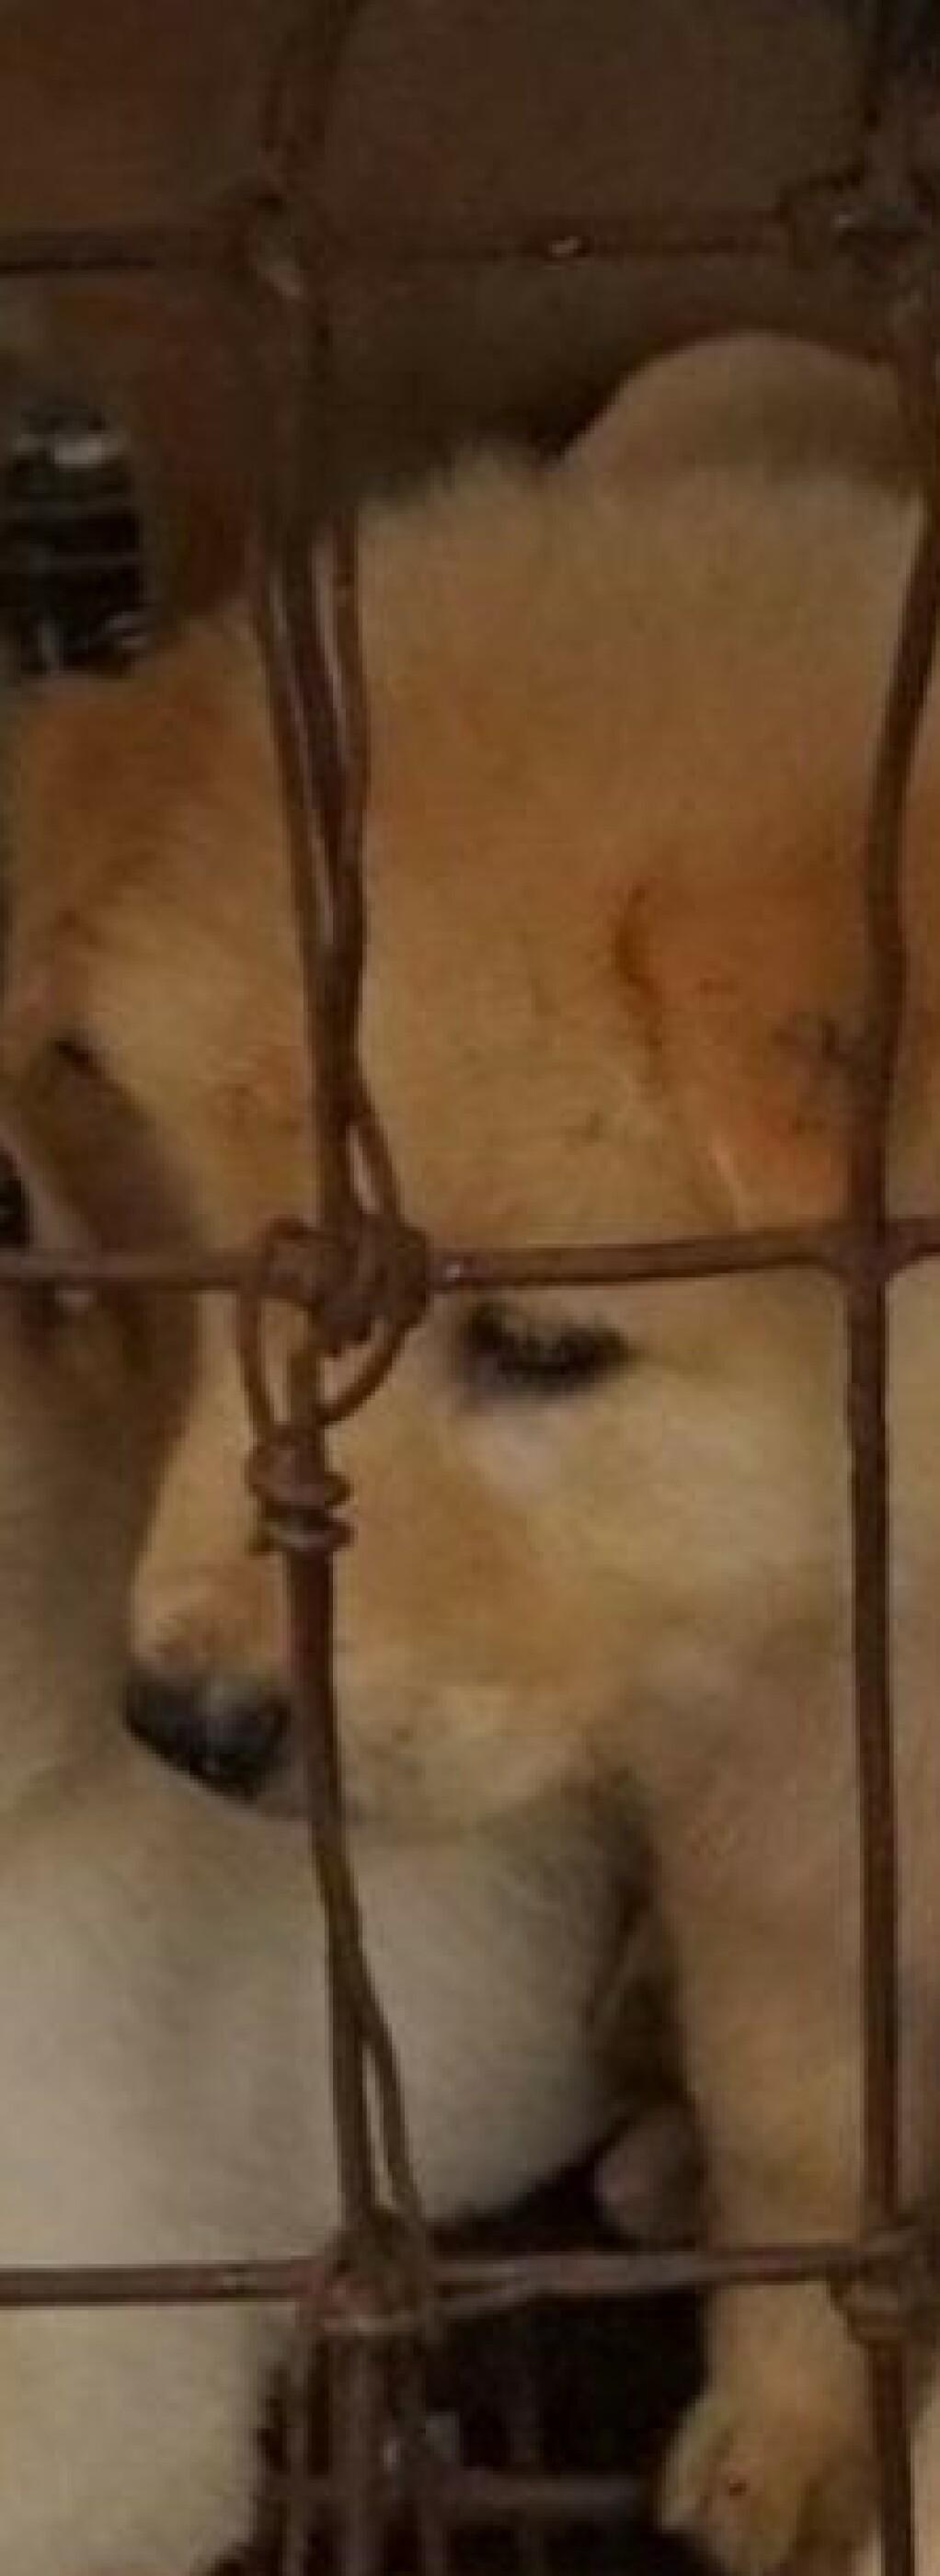 Kina har offentliggjort ny liste om dyr som kan spises